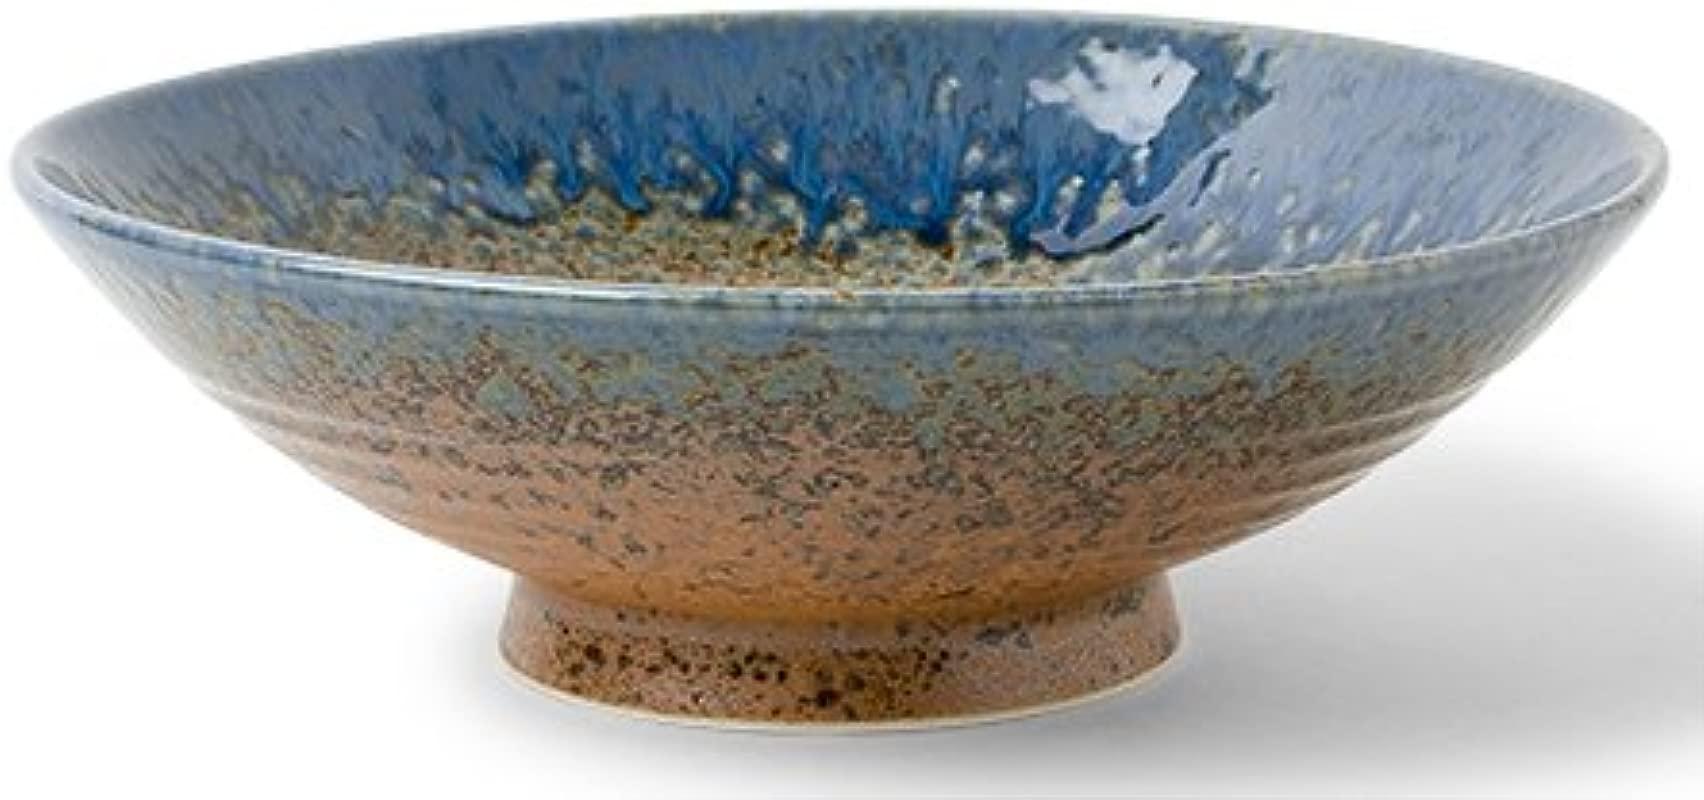 Aoi Nagashi 9 5 Ceramic Serving Bowl